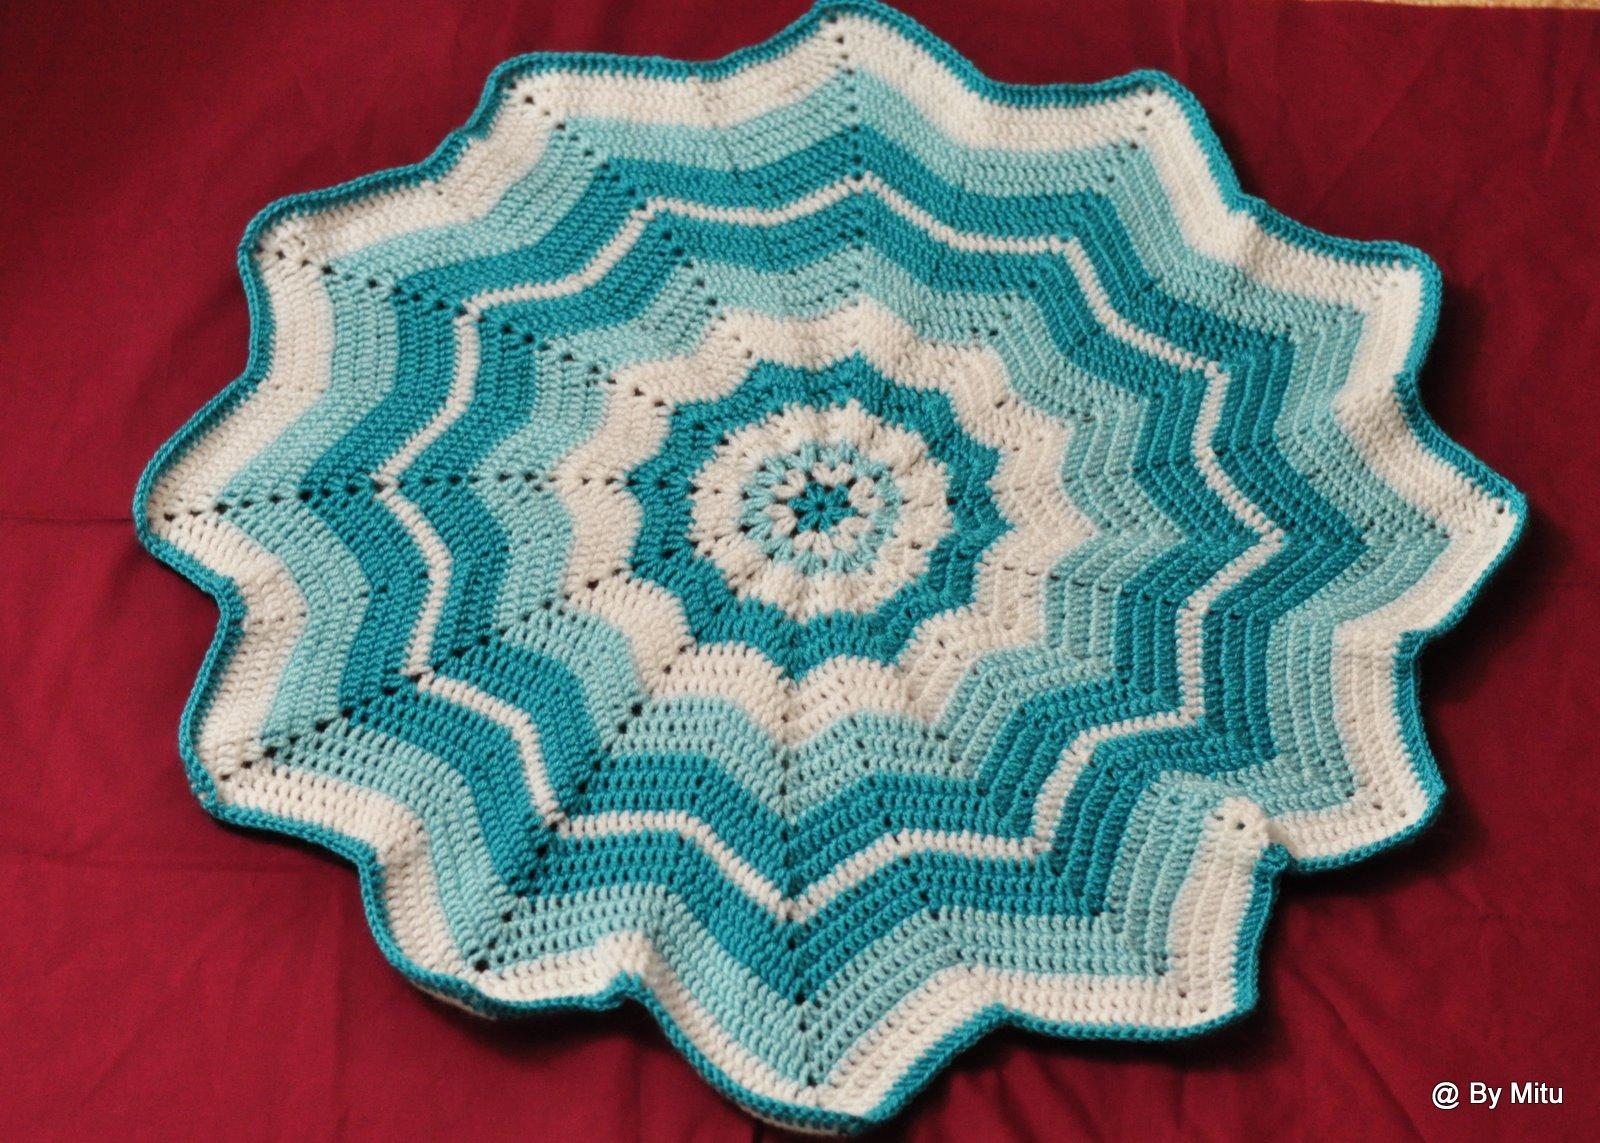 Art and Craft Work: Crochet - Blue Baby Afghan( Blanket)